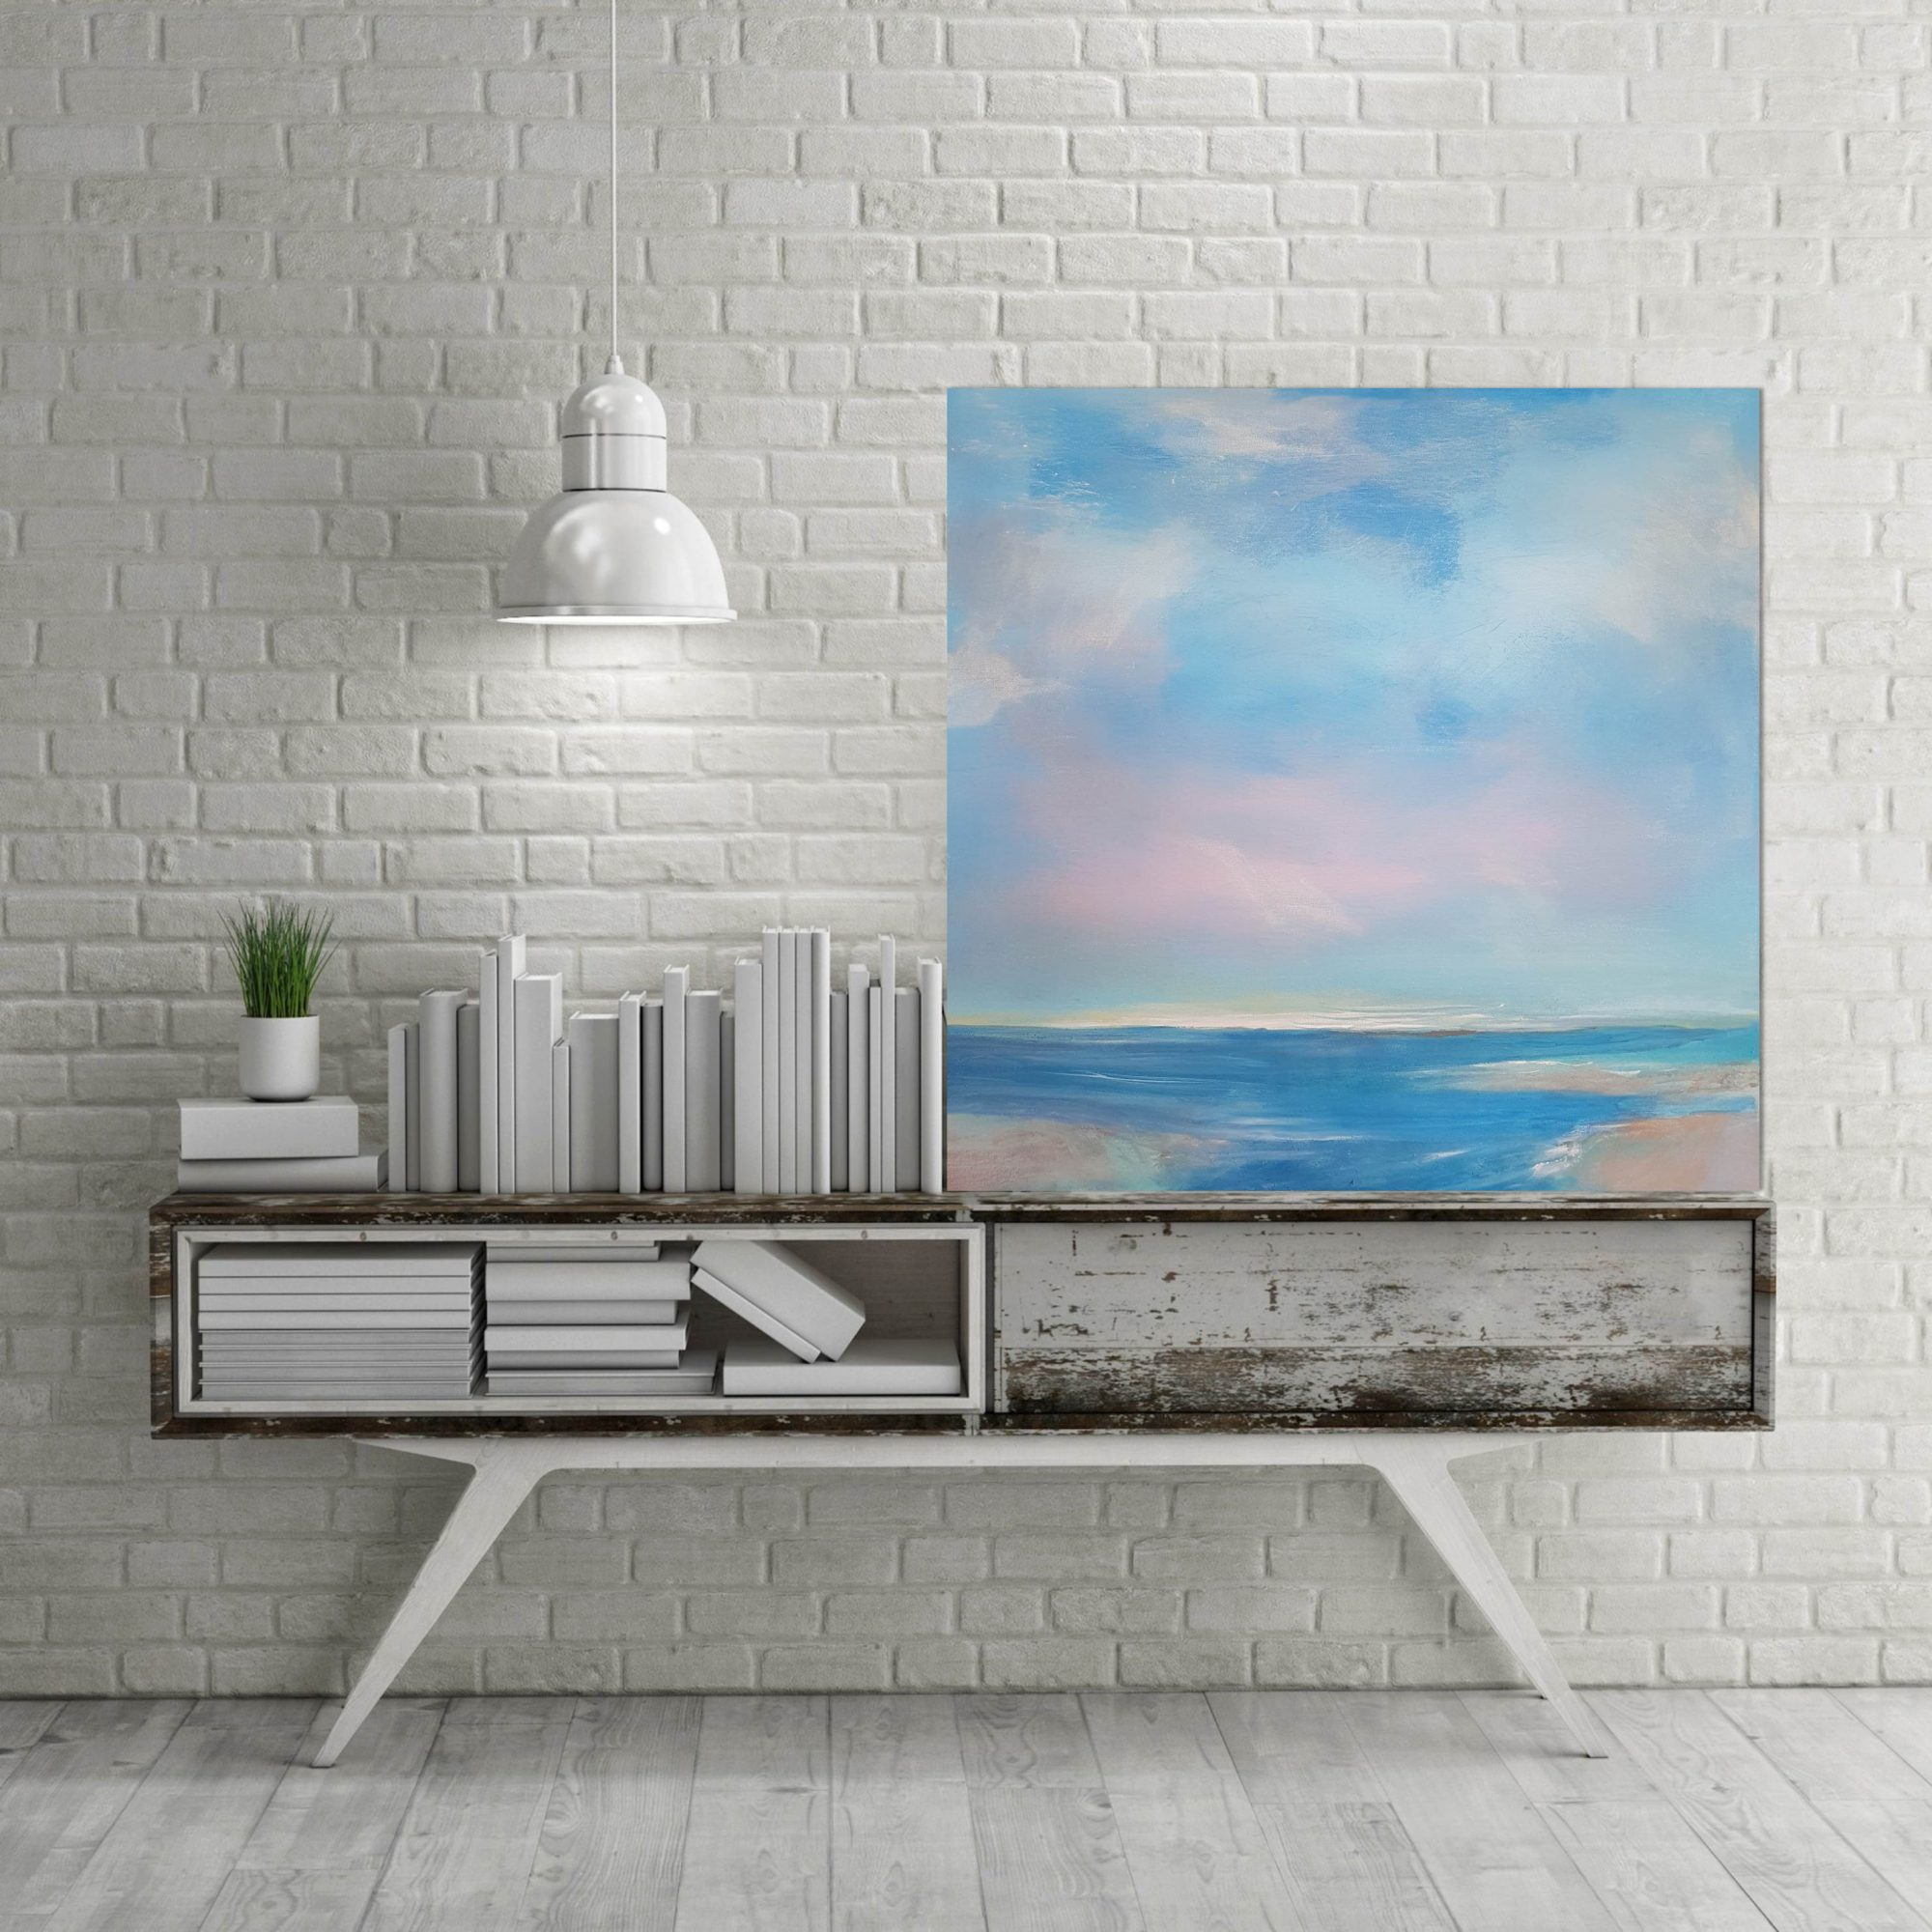 reef-break-shabby-white-bench